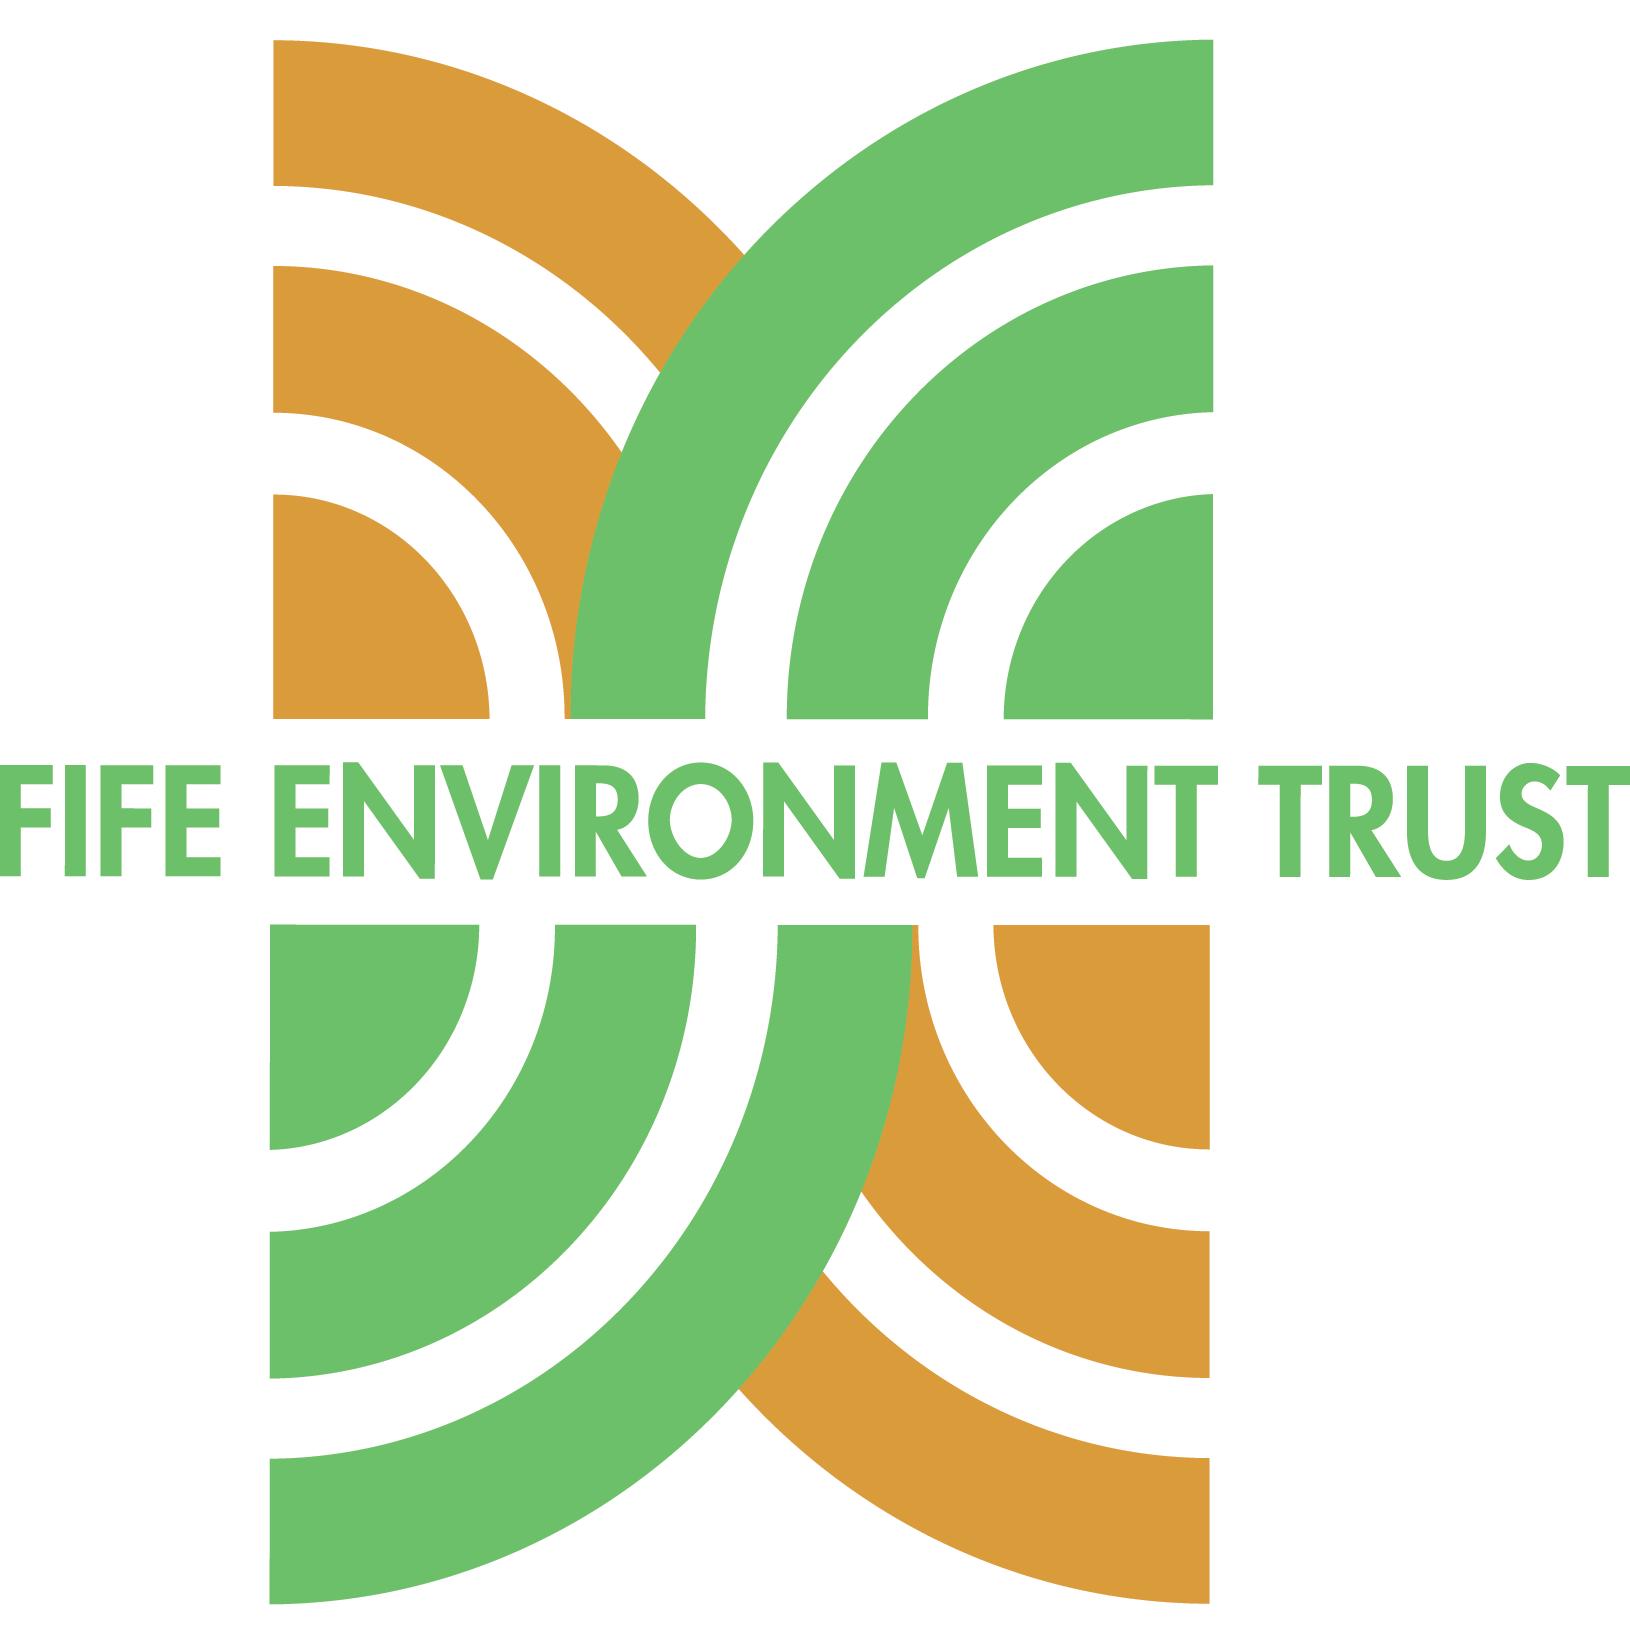 Fife Environment Trust